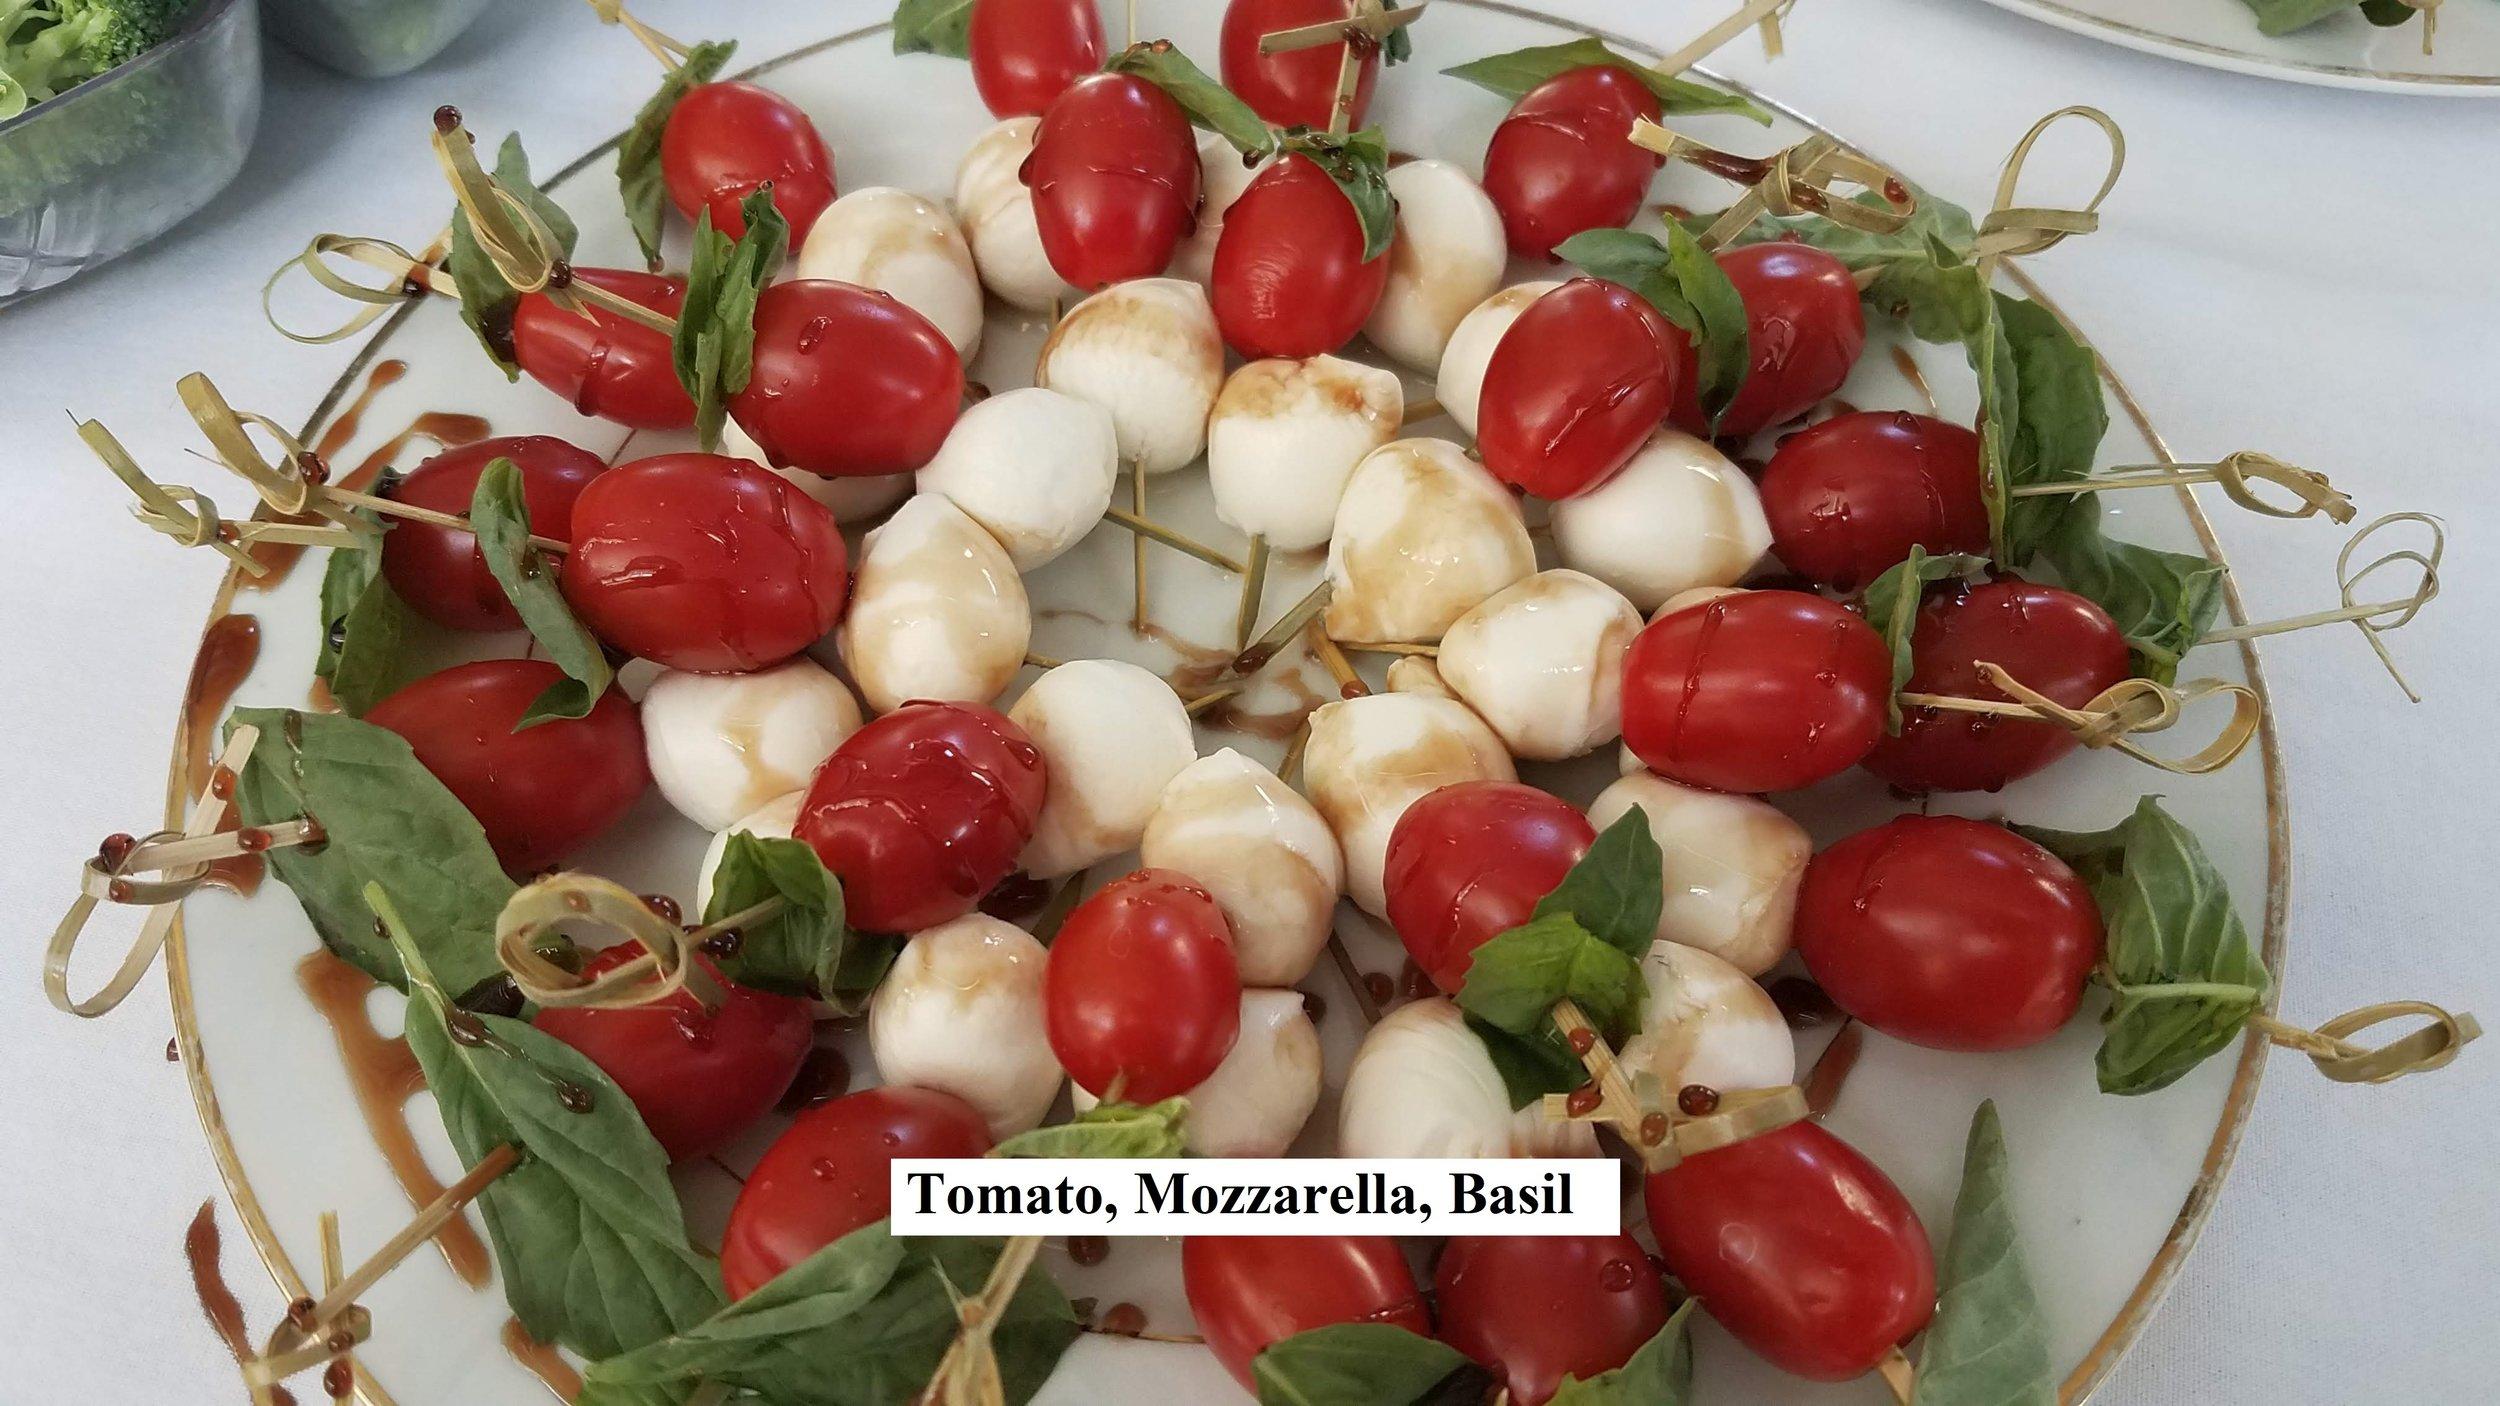 Tomato,mozz, basil.jpg